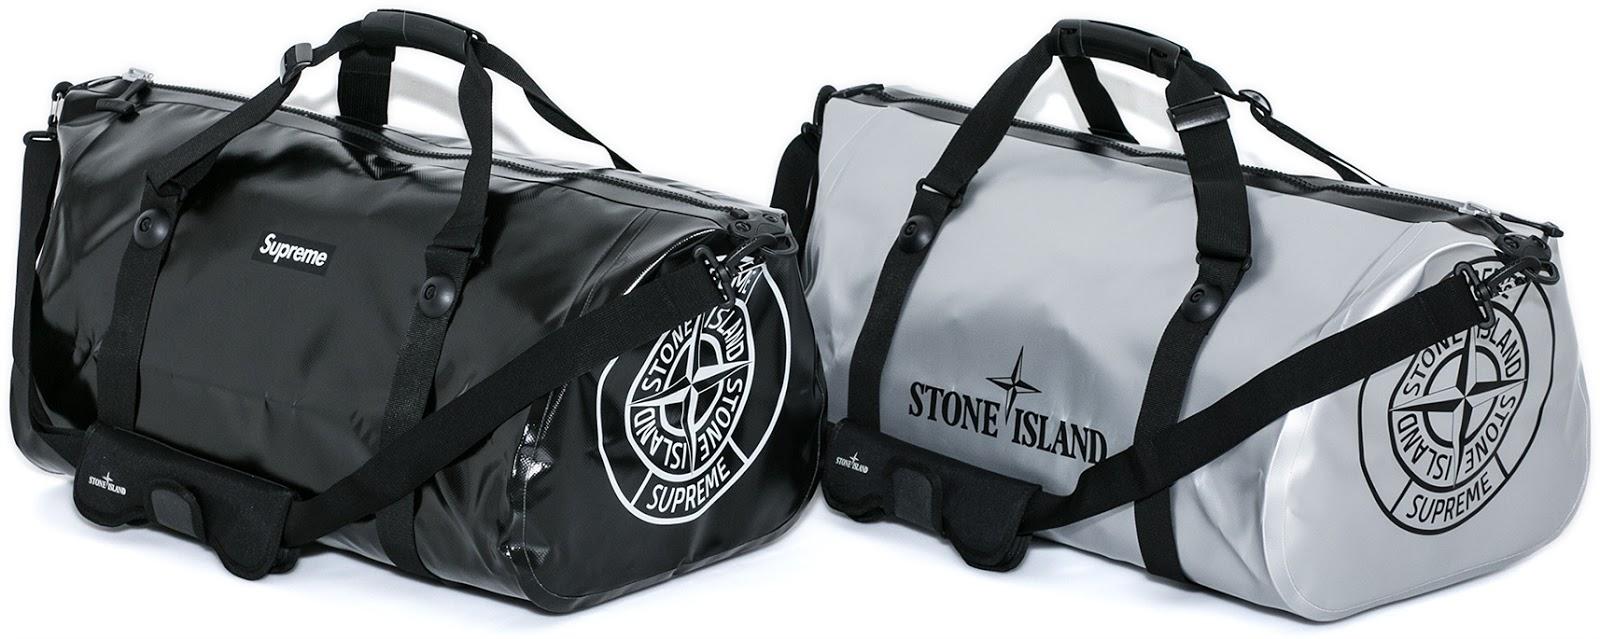 streetwear brasil supreme stone island primavera verao 2016 14 - Supreme x Stone Island Primavera/Verão 2016